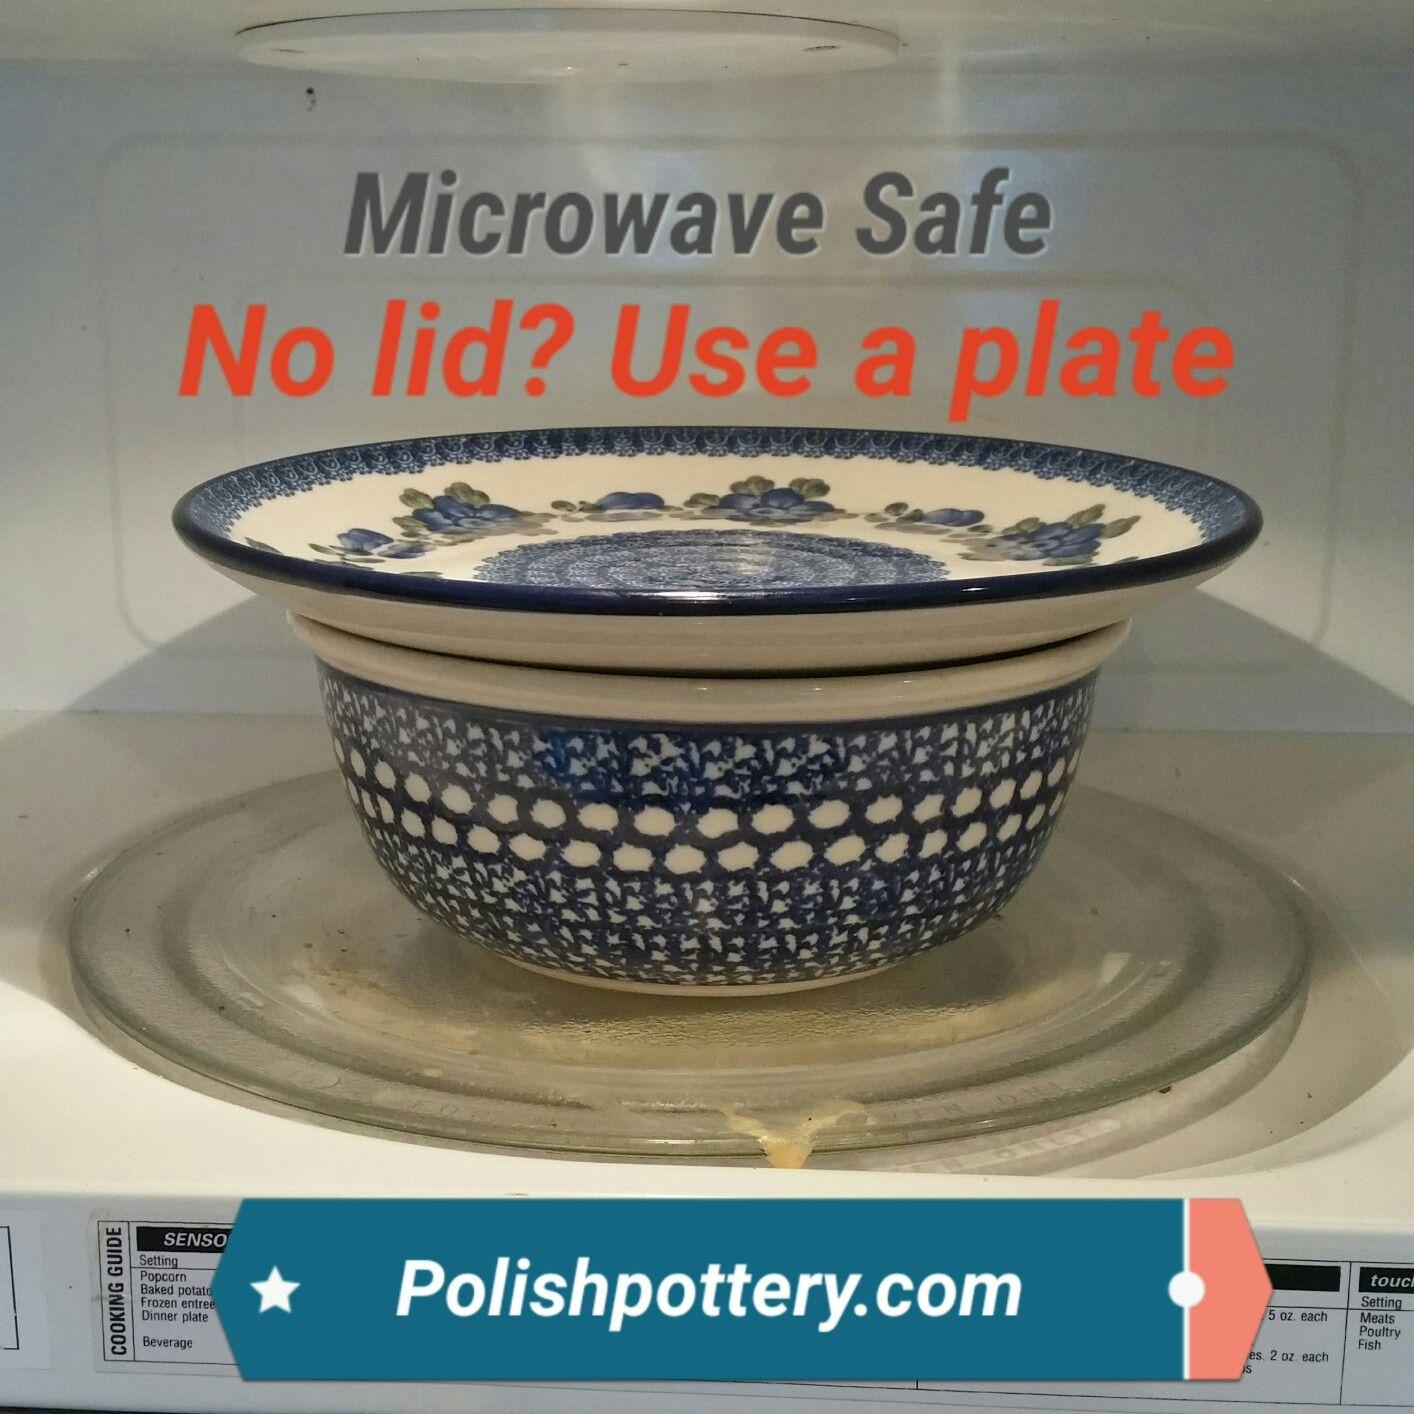 microwave safe polish pottery no lid